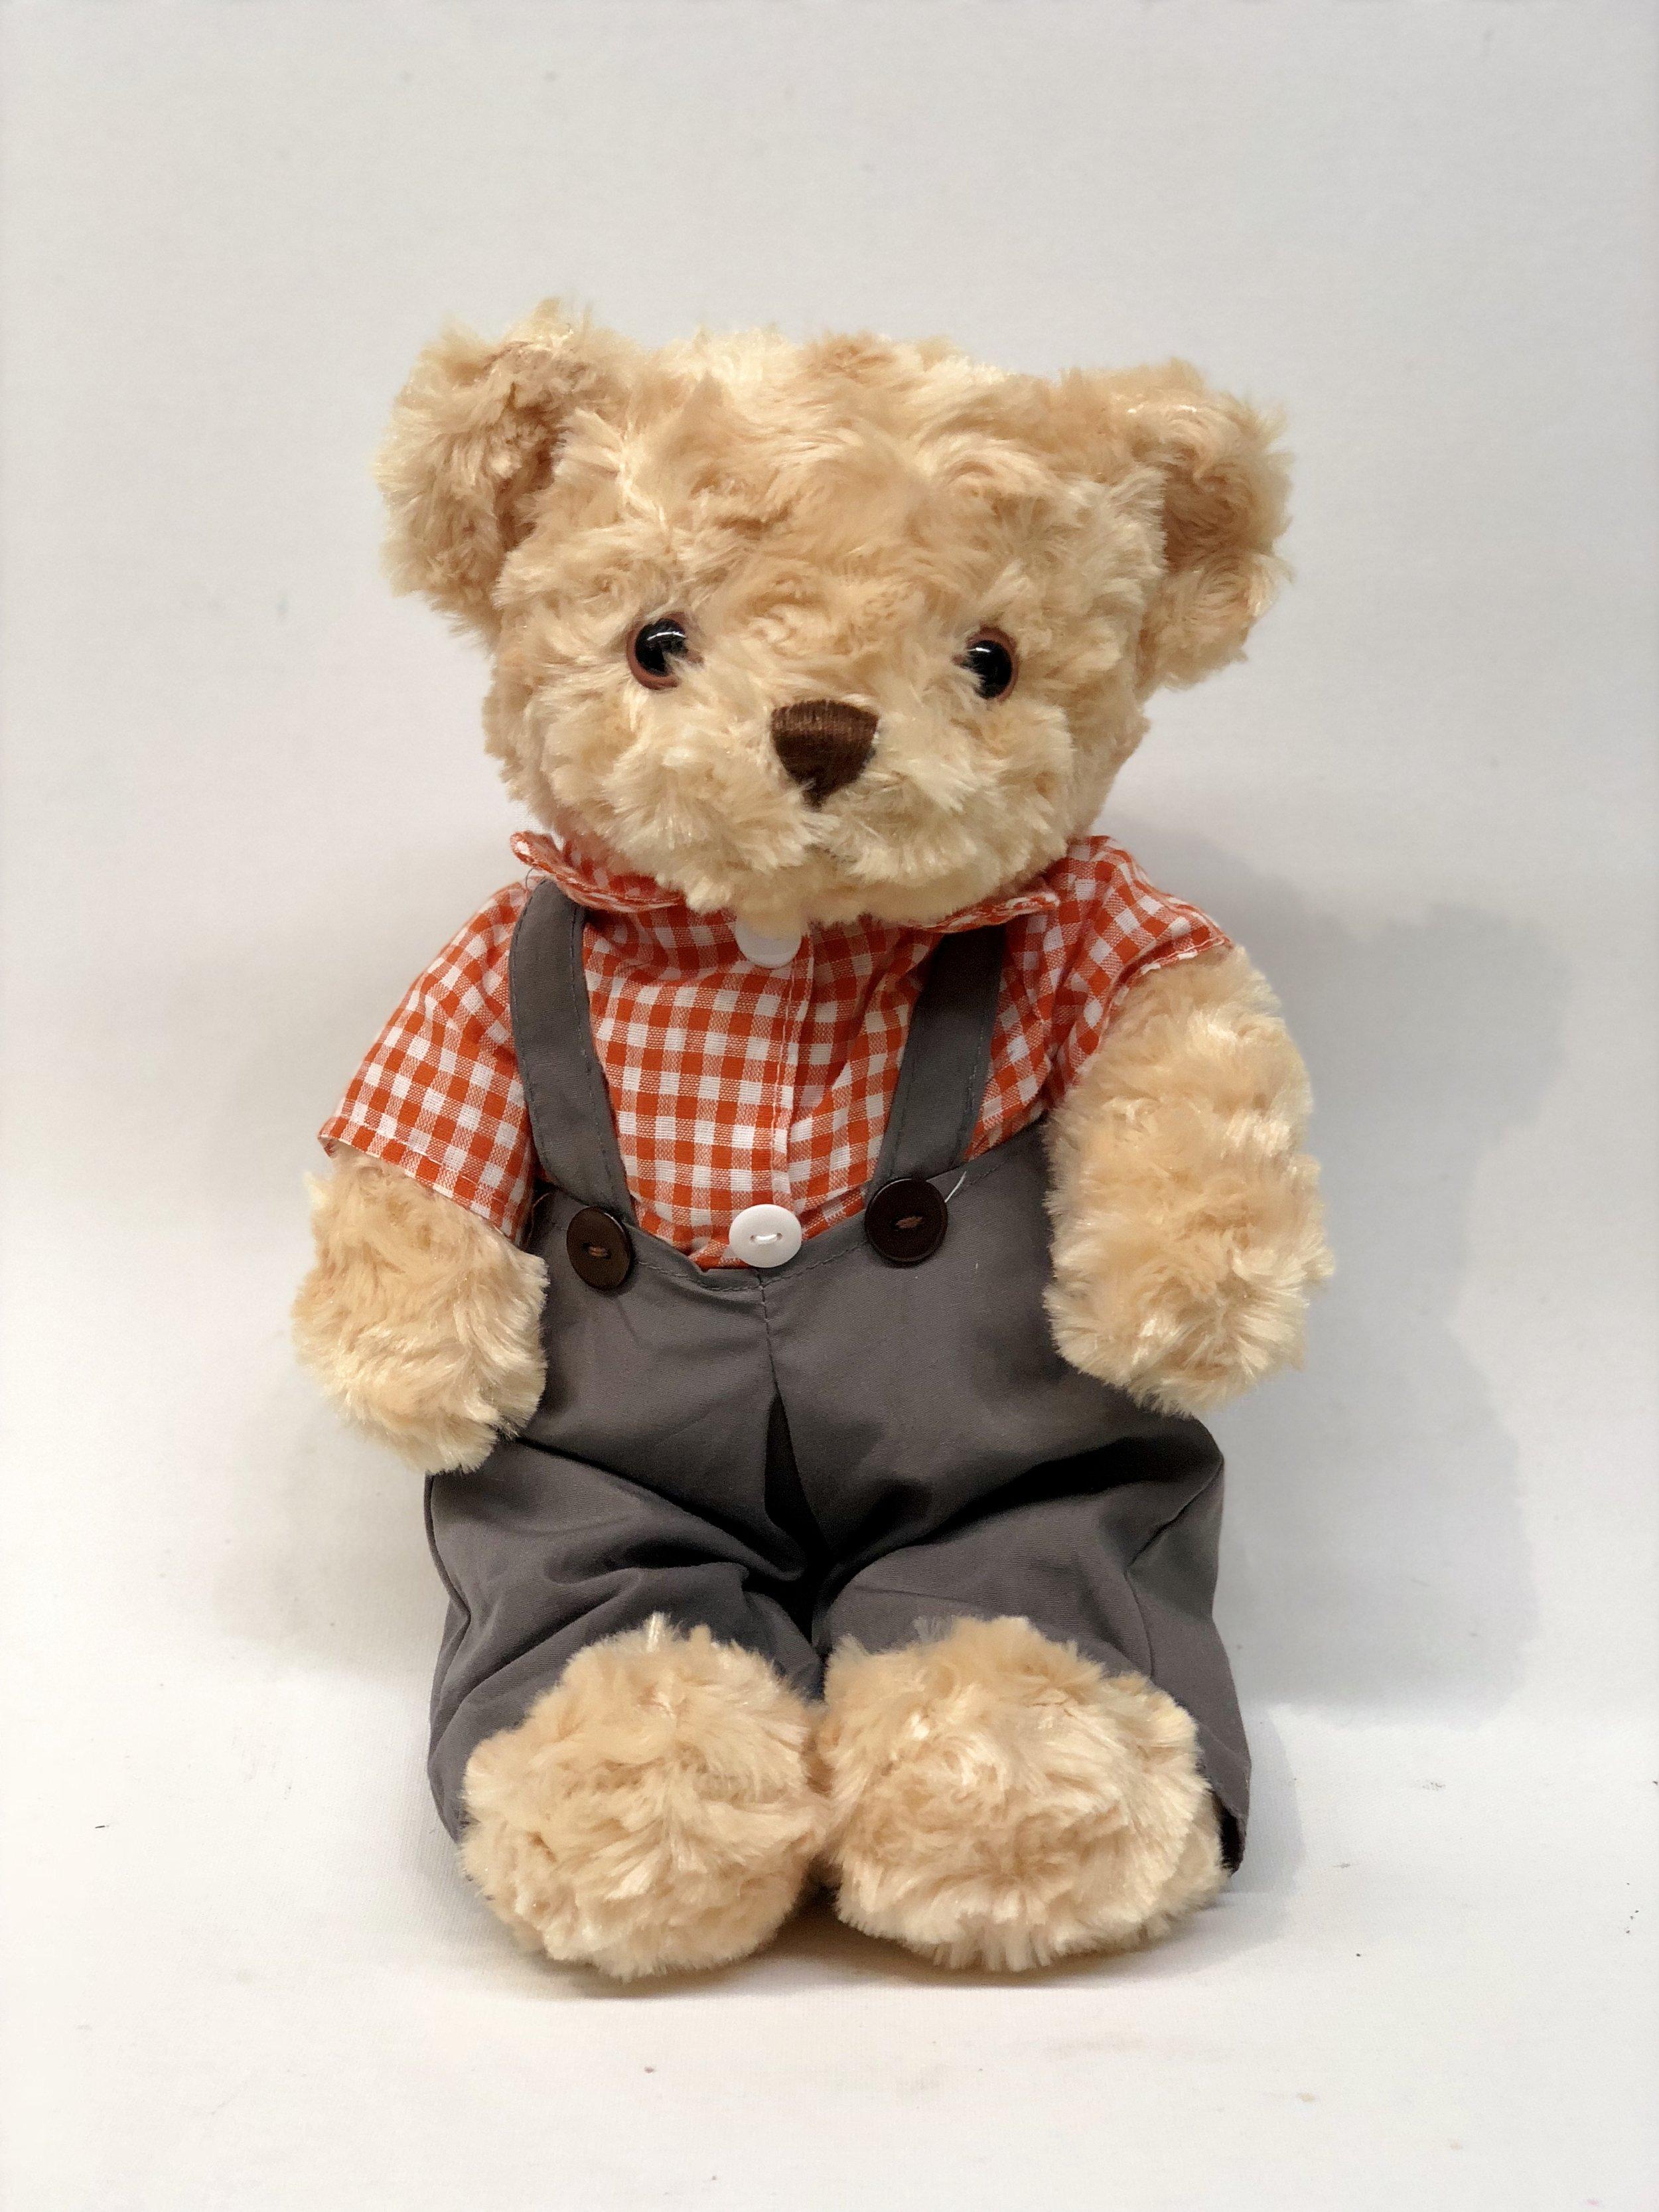 Overalls Teddy Bear -